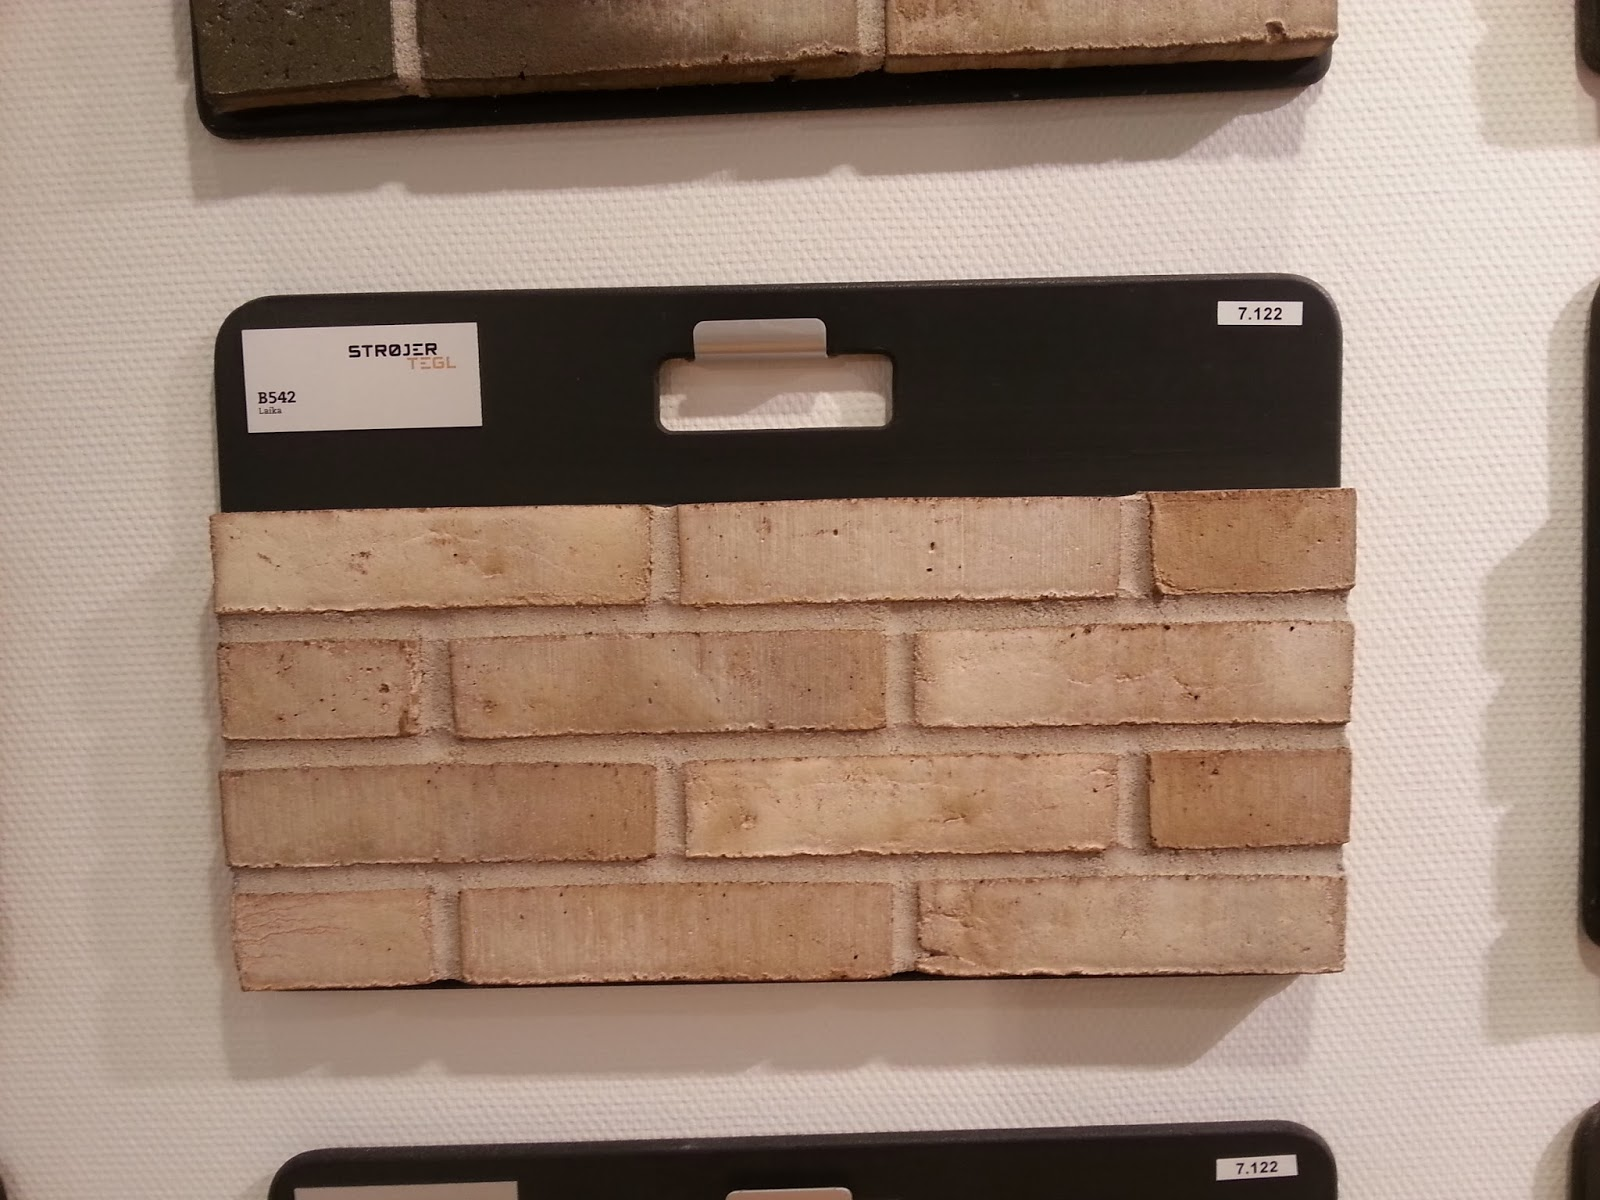 Huscompagniets mursten - Strøjer Tegl, Laika B542